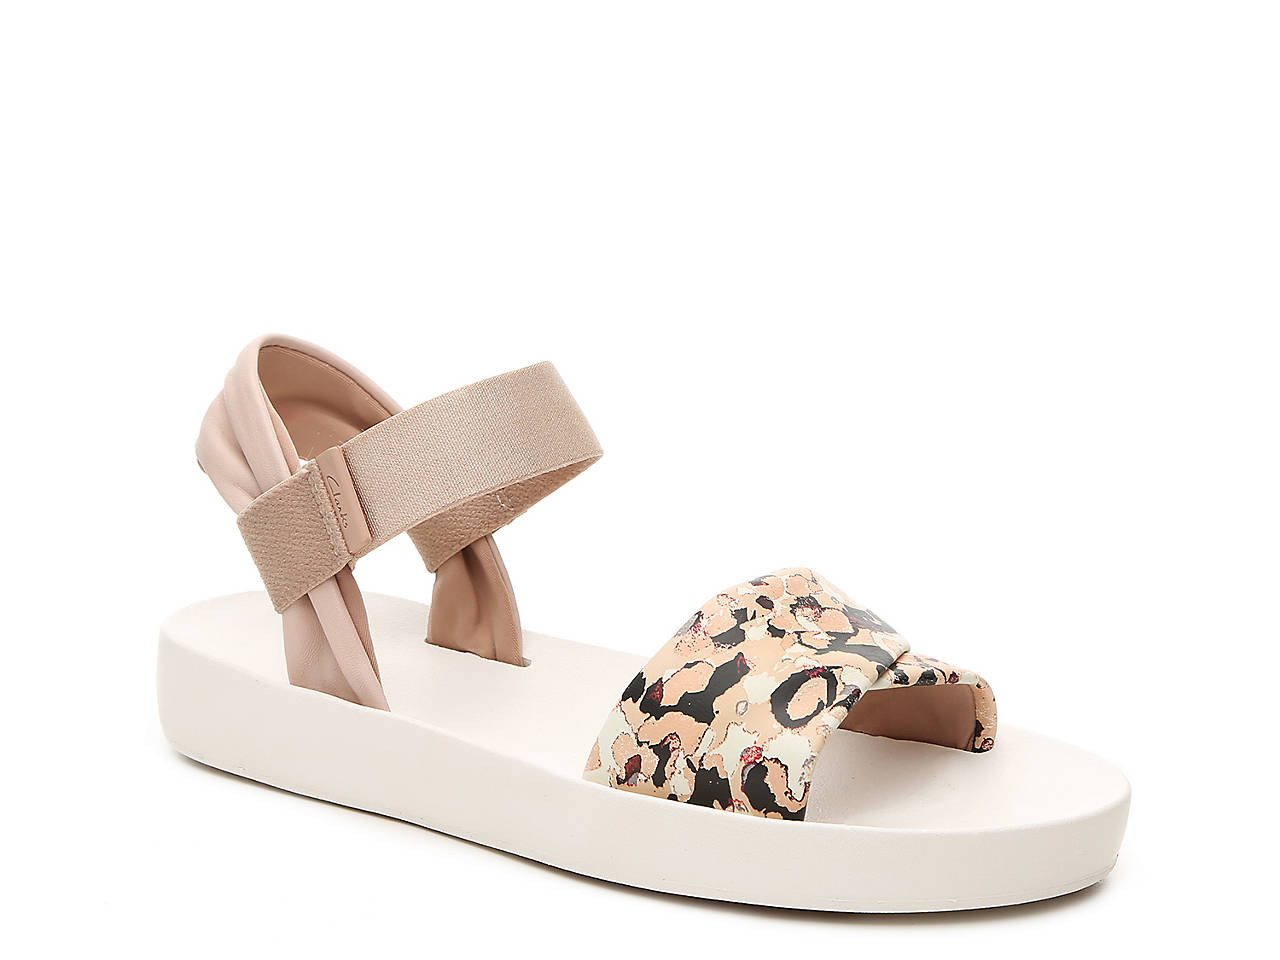 7f345aed480 Clarks Seanna Sun Sport Sandal Women s Shoes